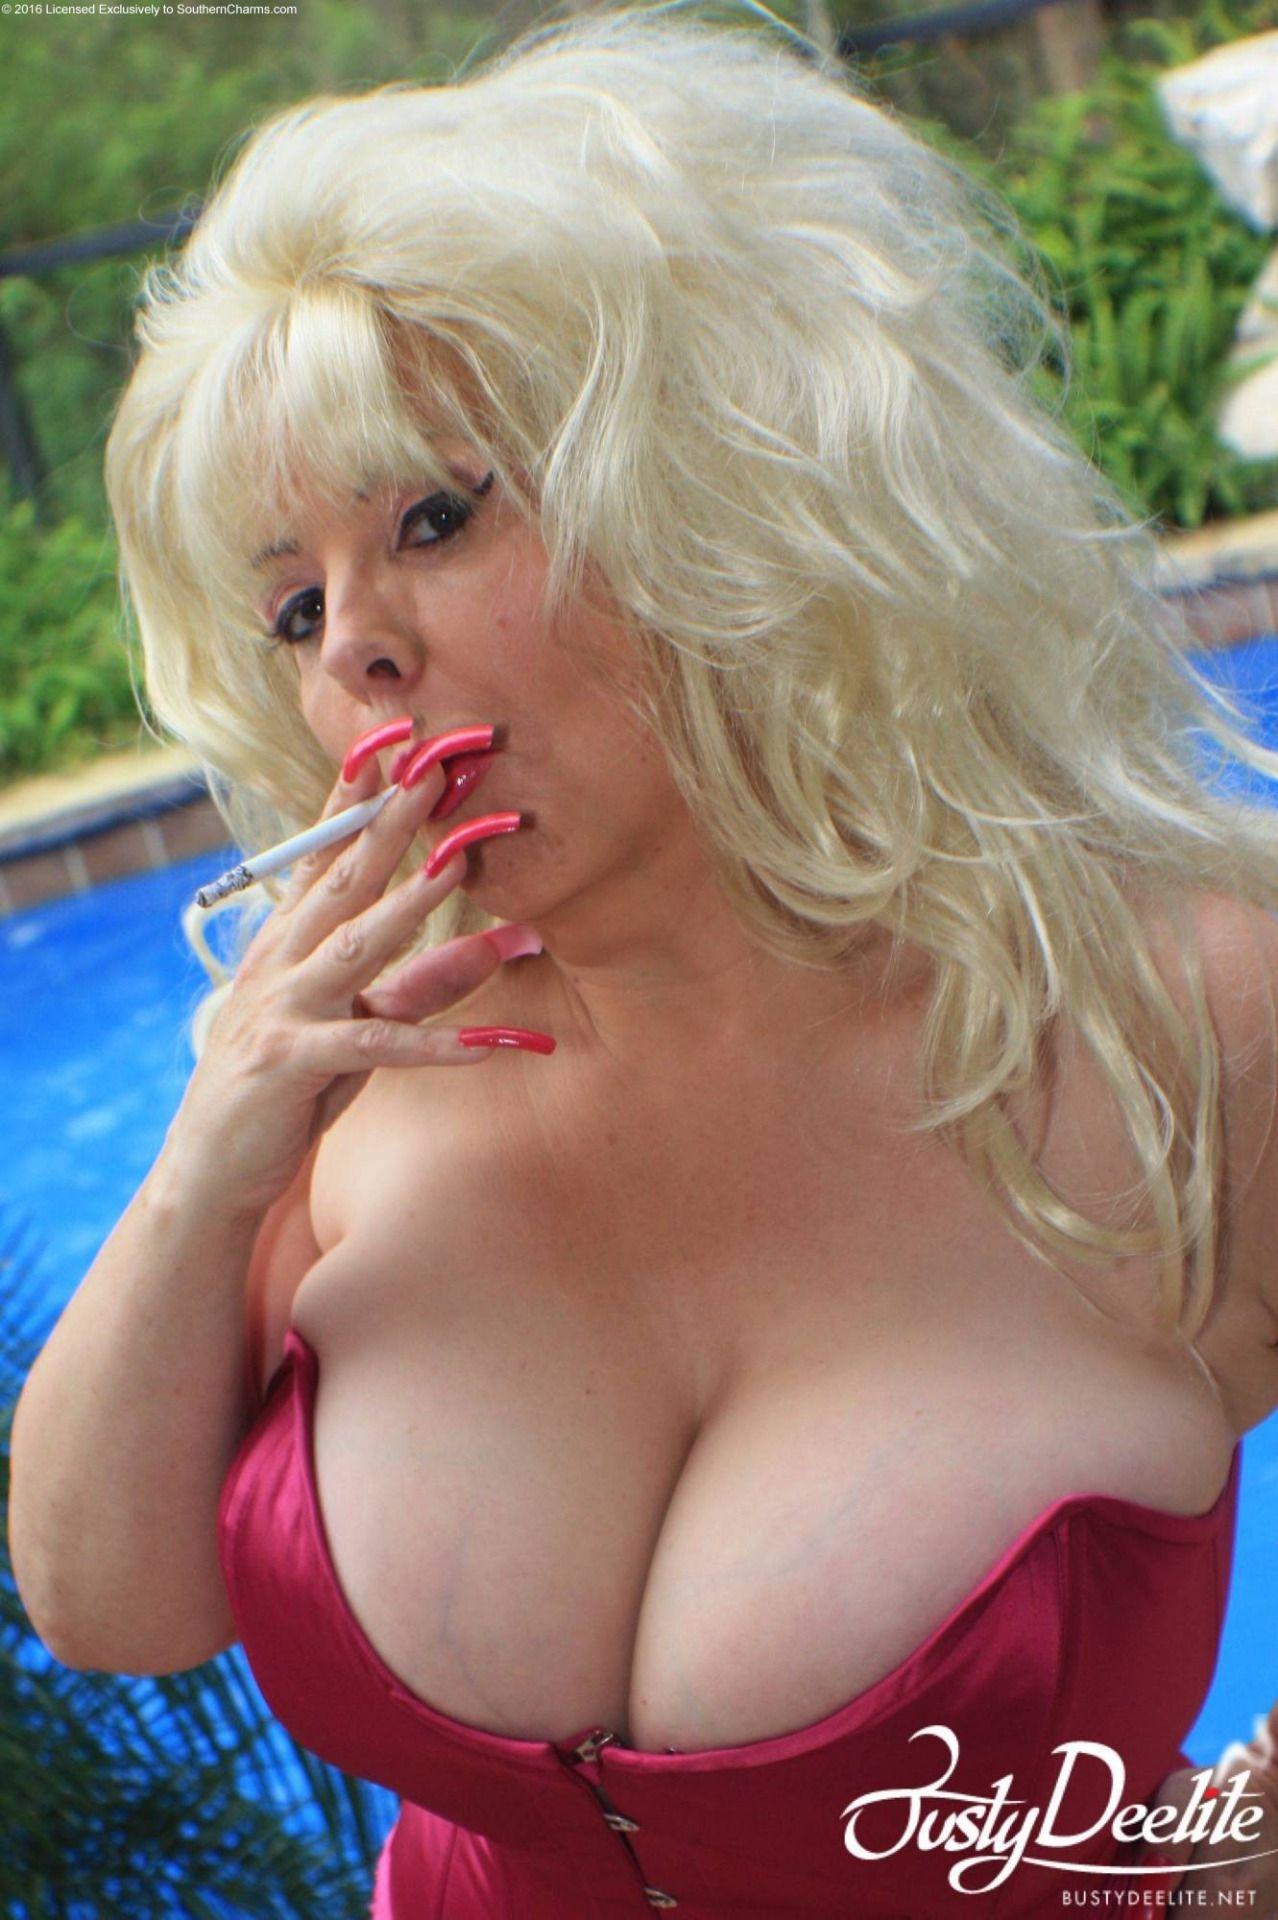 Busty Deelite Xxx Porn Pics And Images